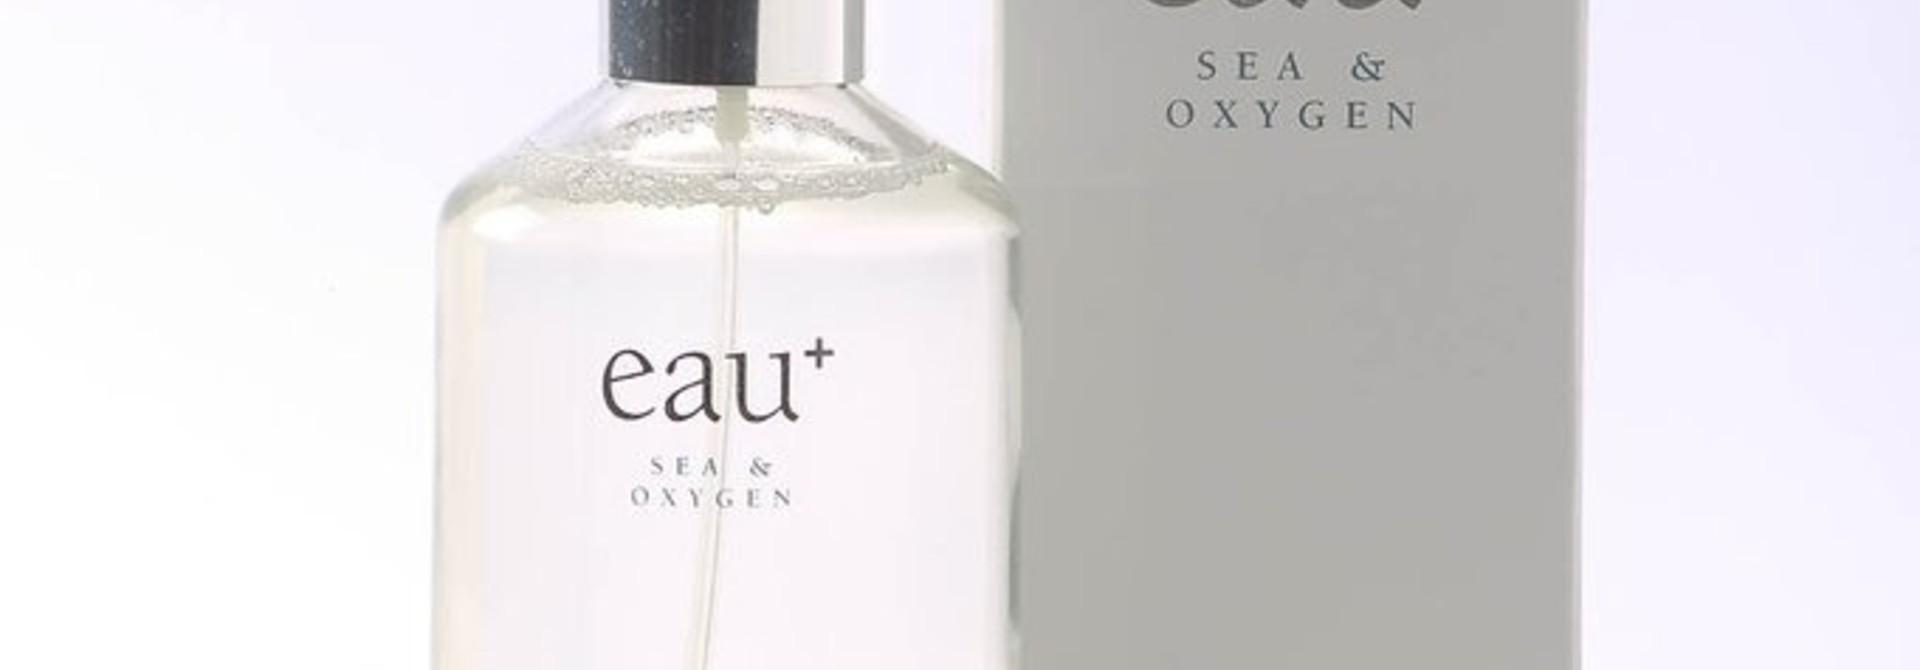 Eau+ Sea & Oxygen - Body Spray